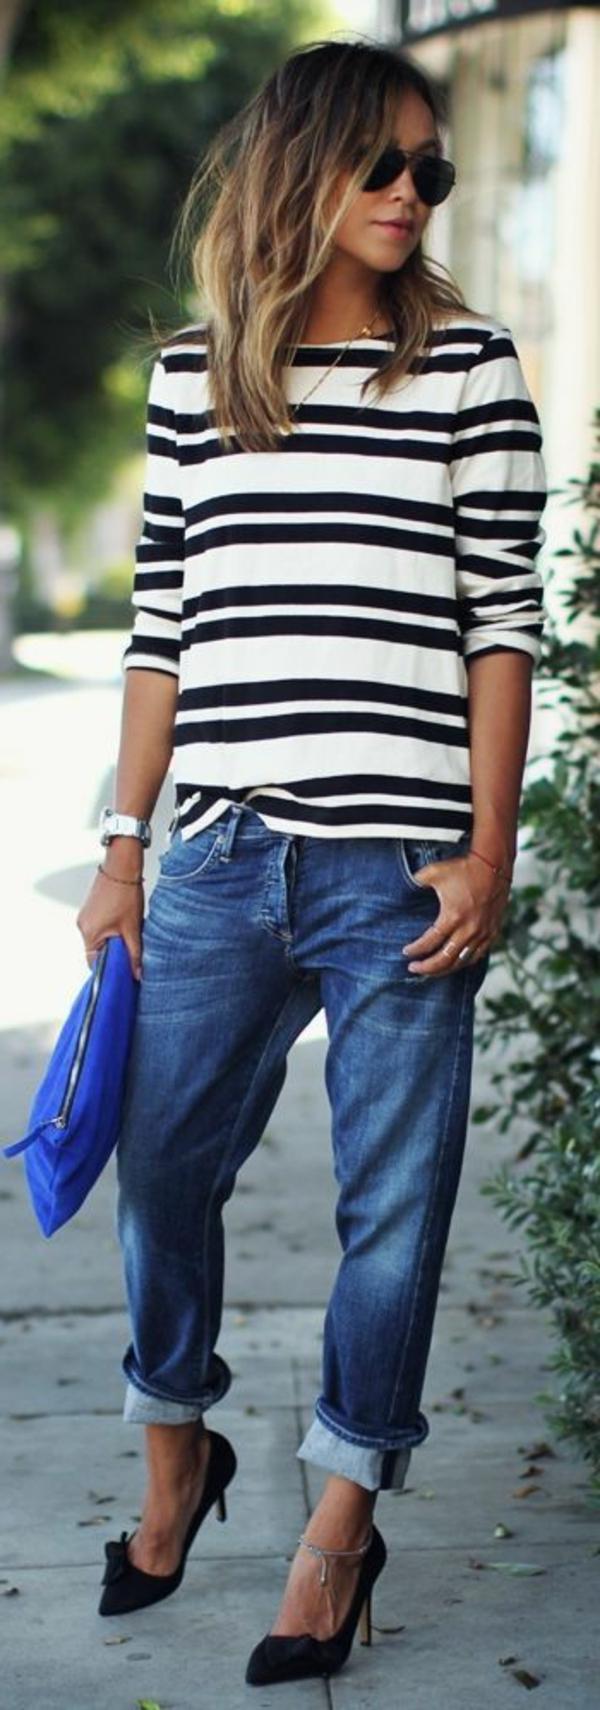 jean-taille-haute-feminine-boyfriend-jeans-chaussures-talon